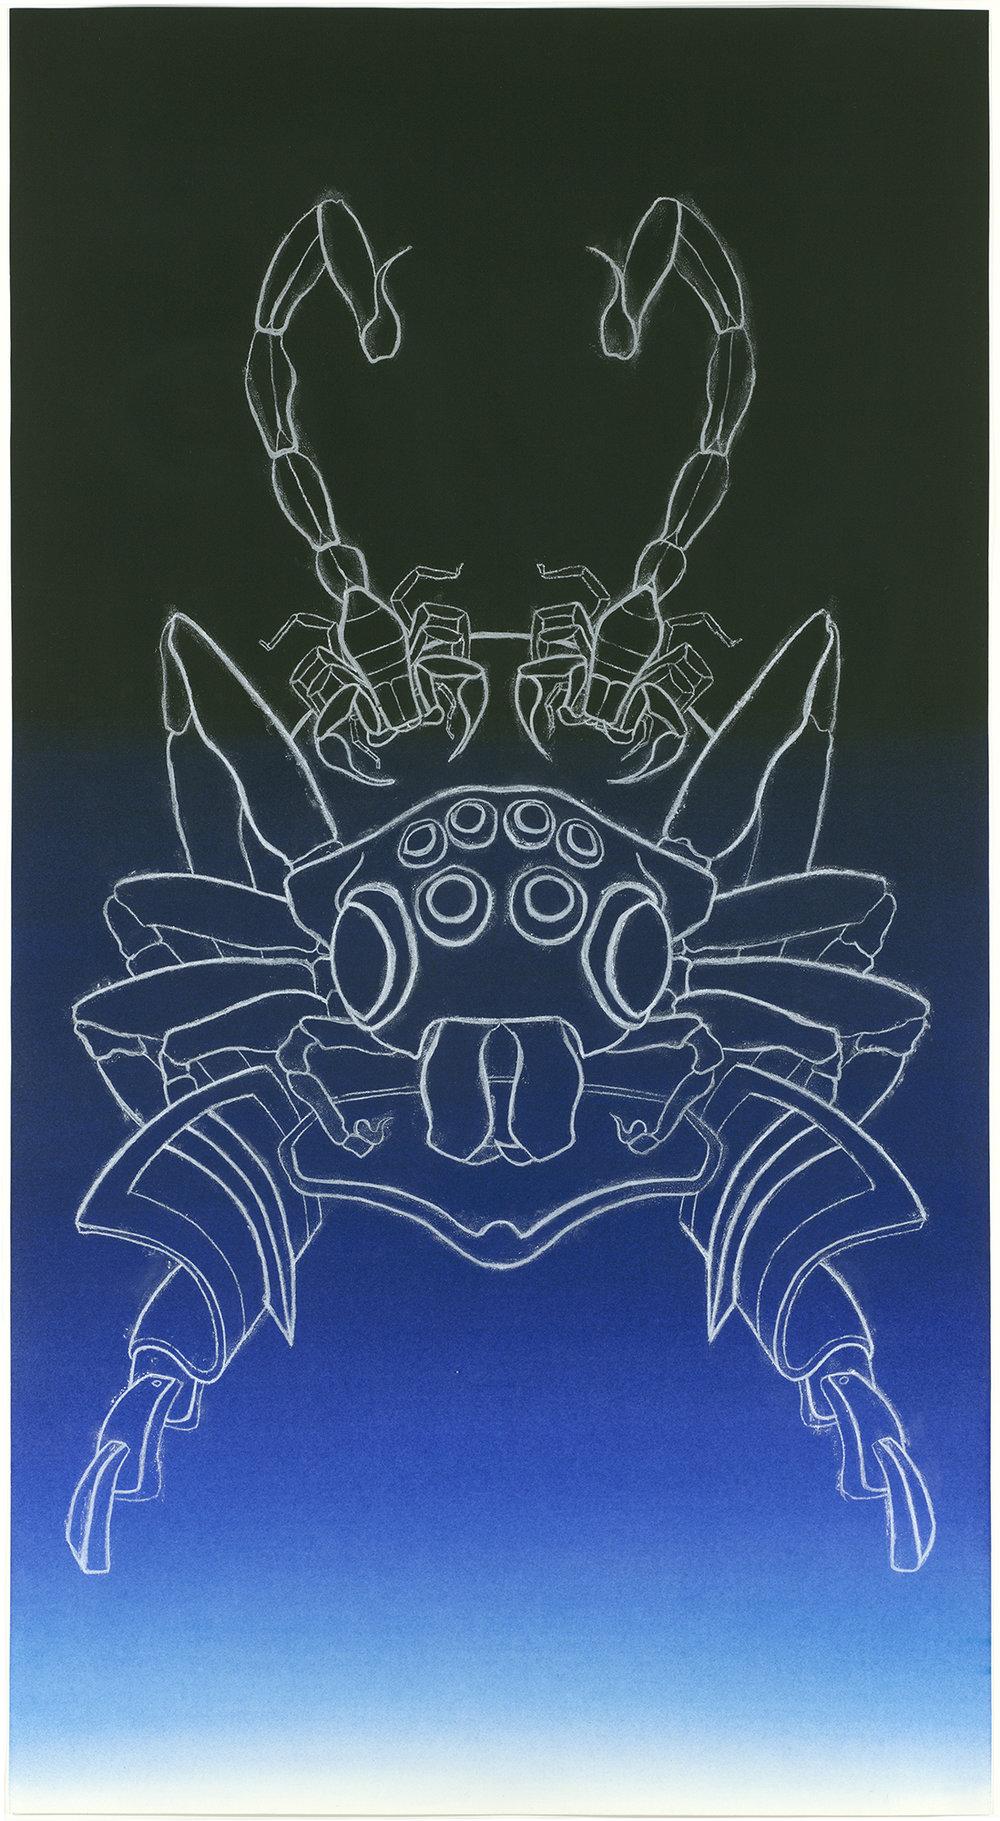 Samurai Helmet #23, 1990